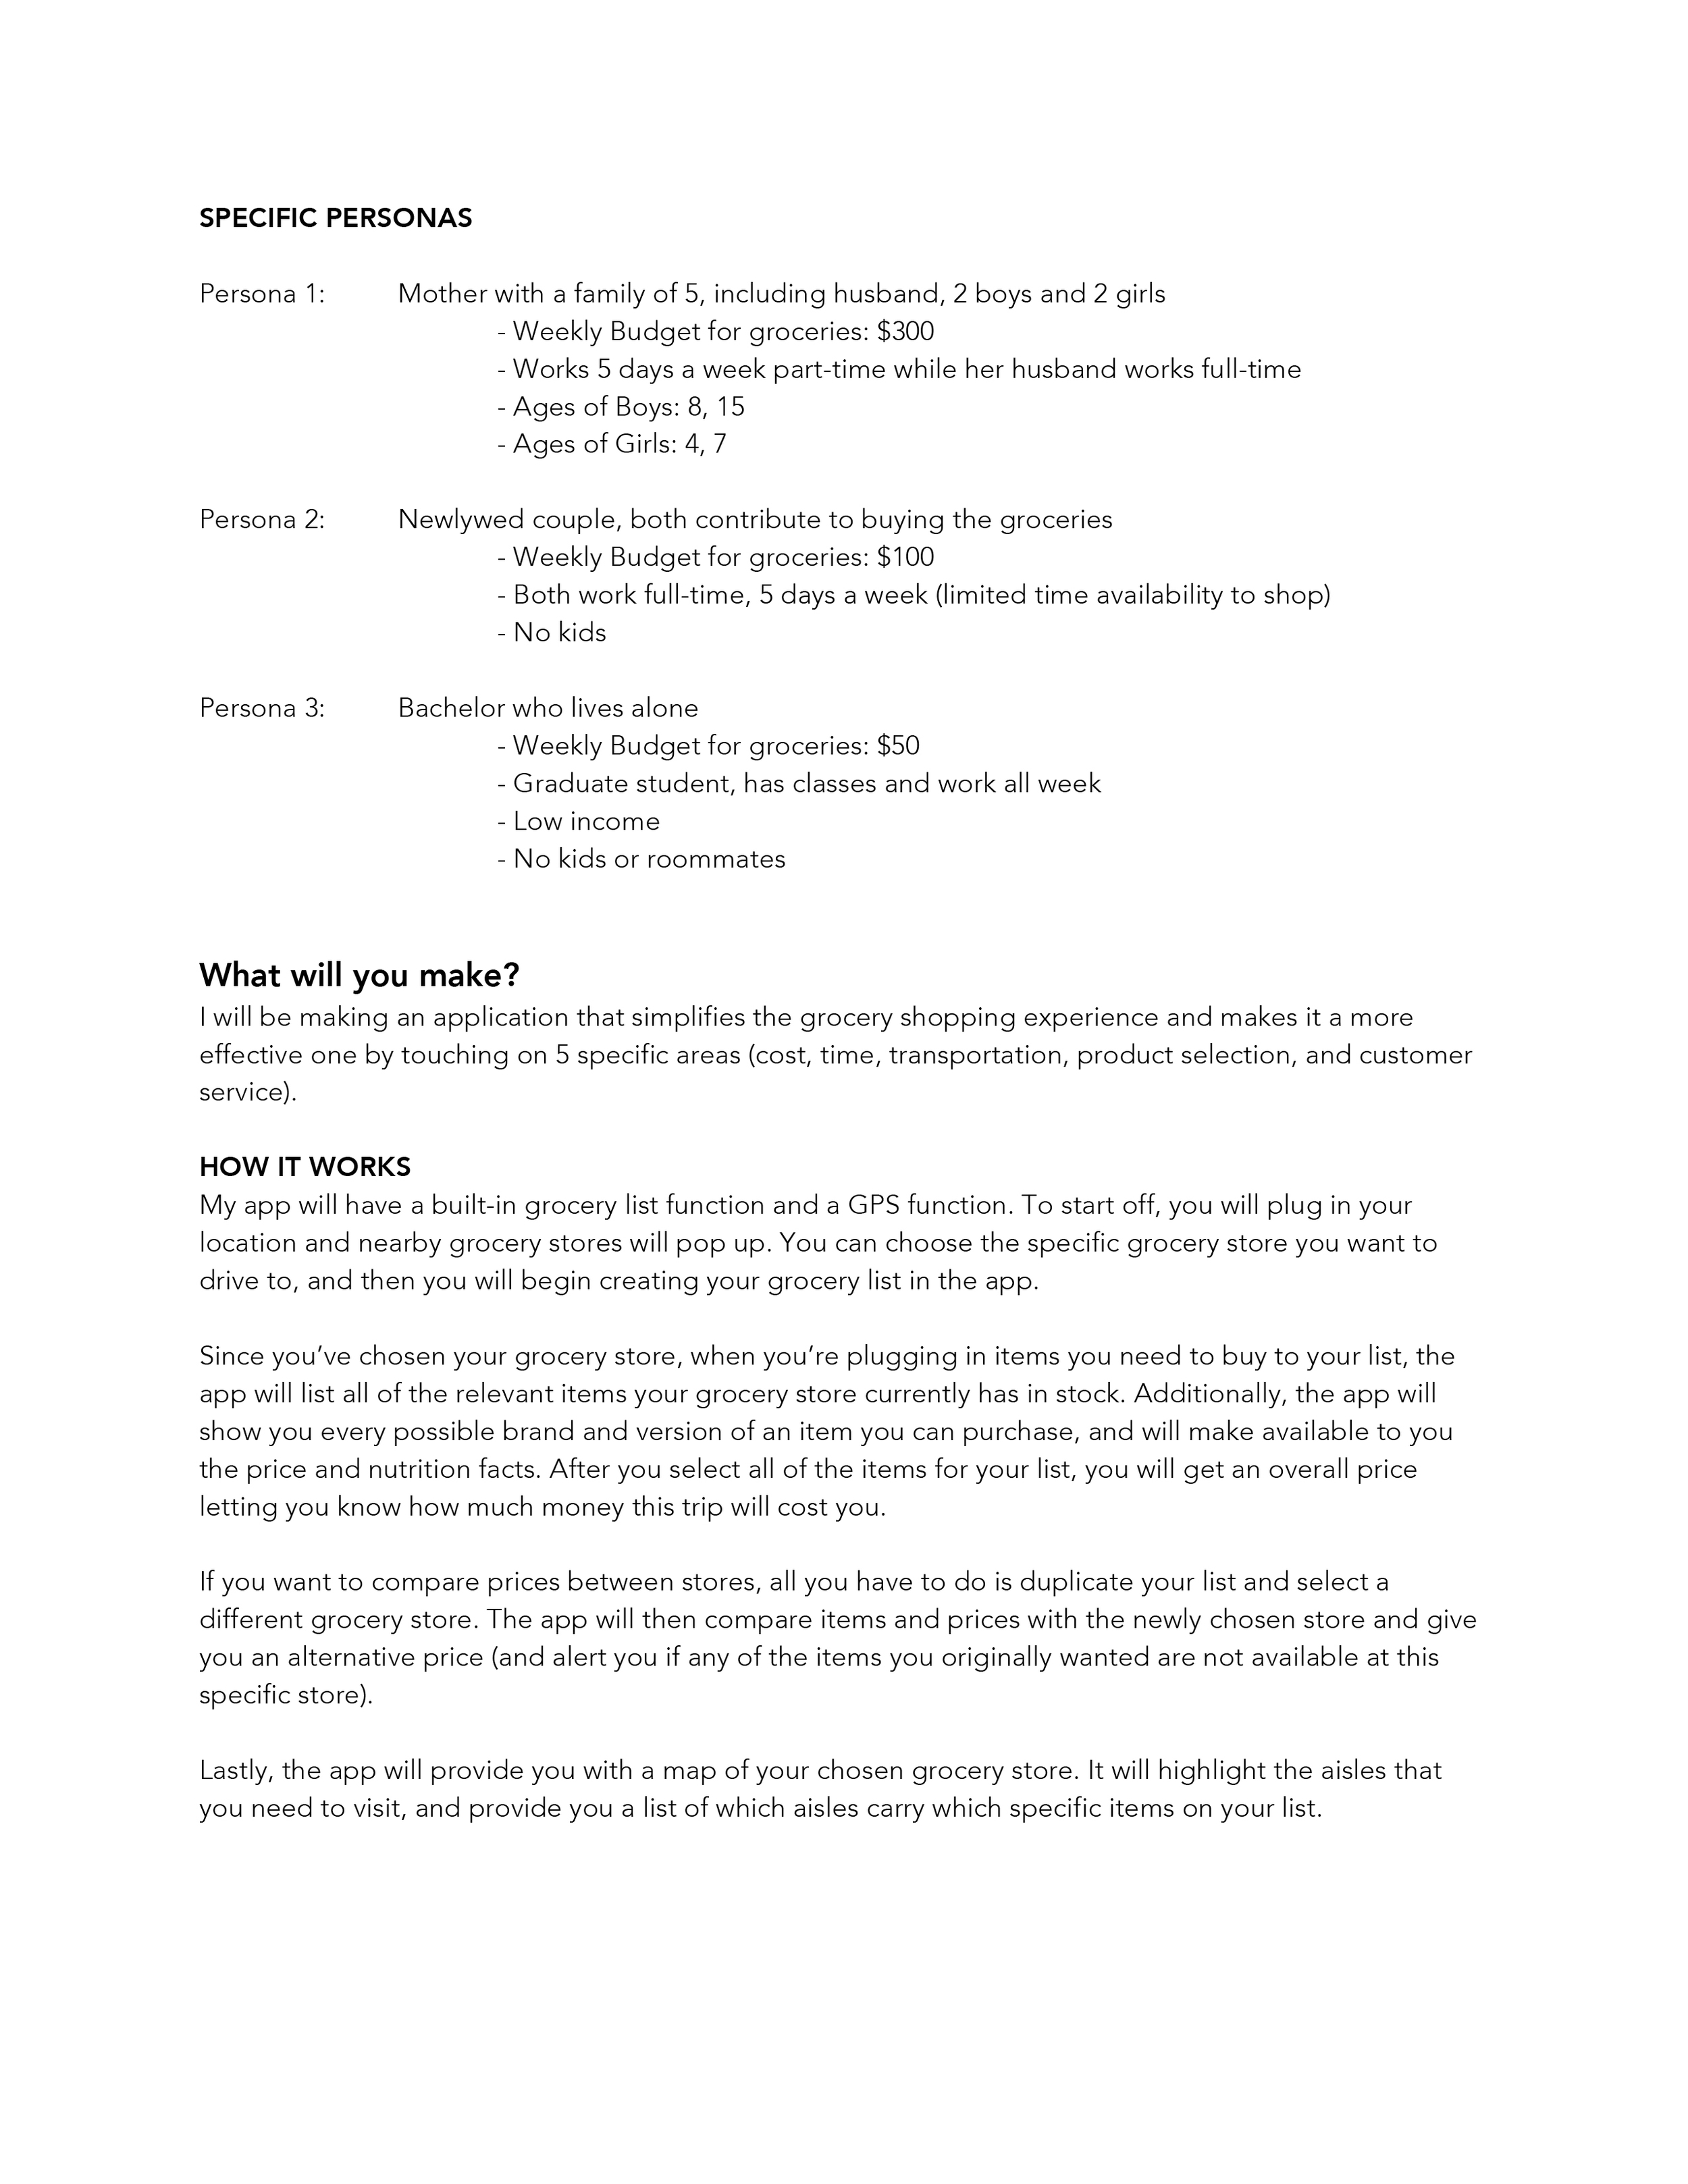 ProjectBrief2.jpg